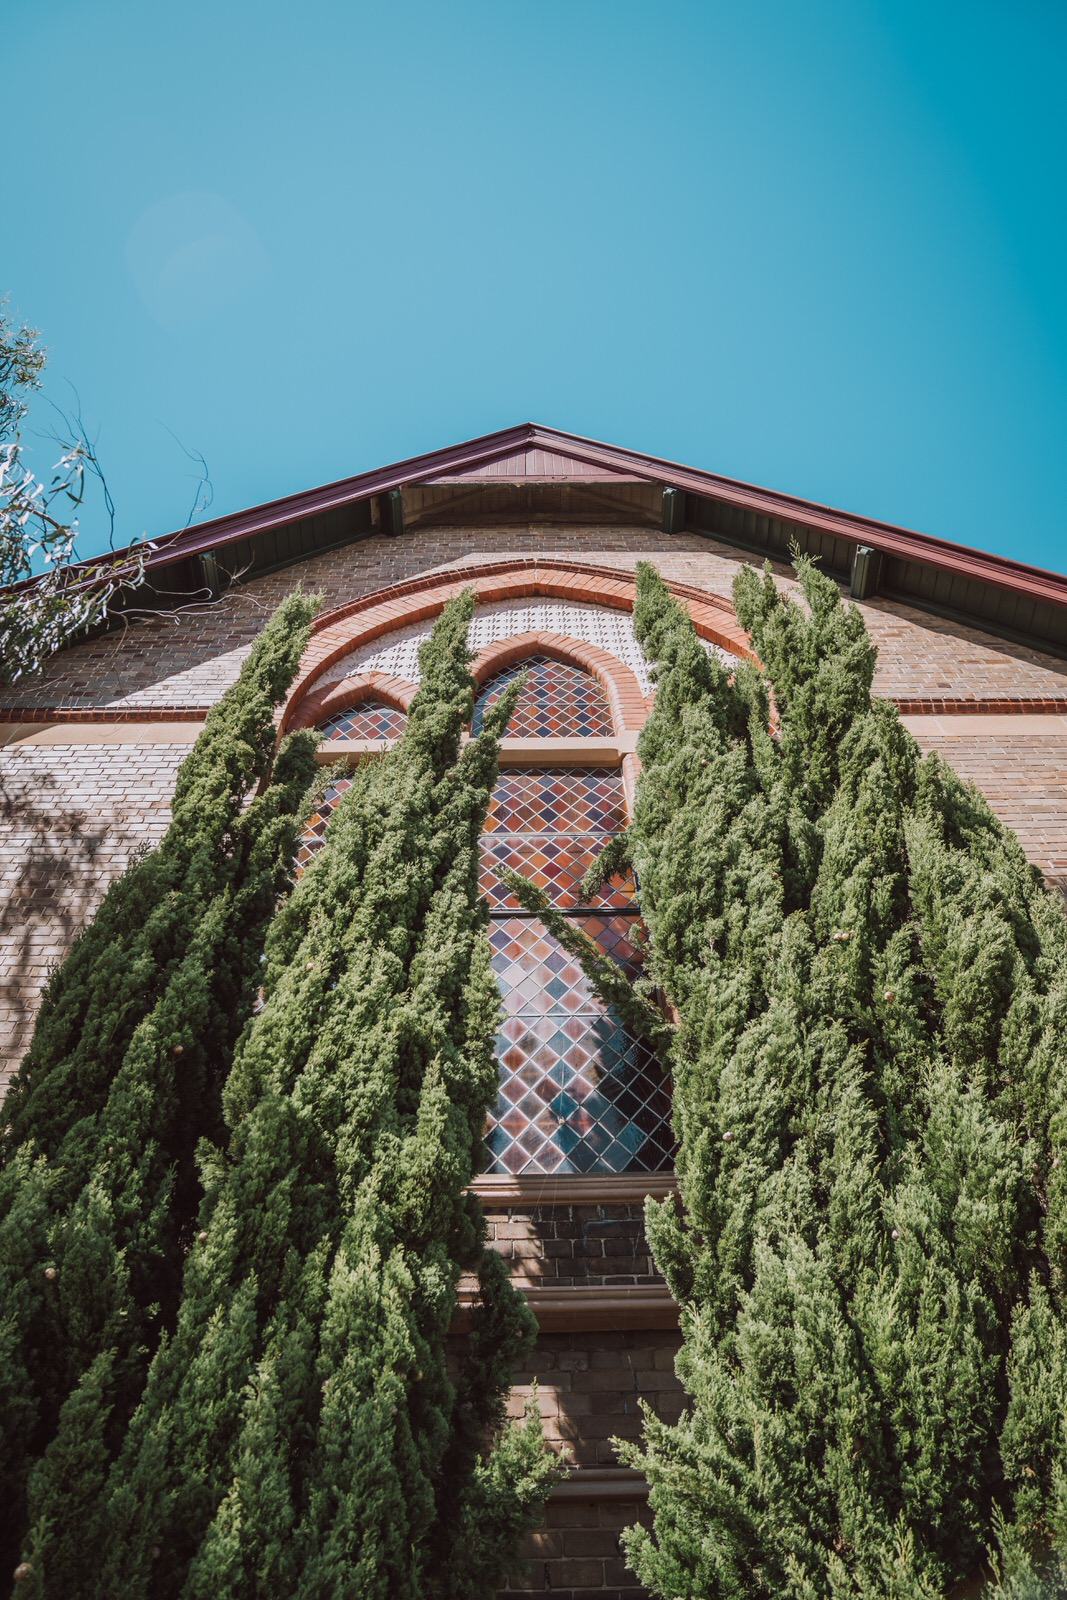 anna-guille-sacred-heart-church-zestmosman-balmoral-beach--79